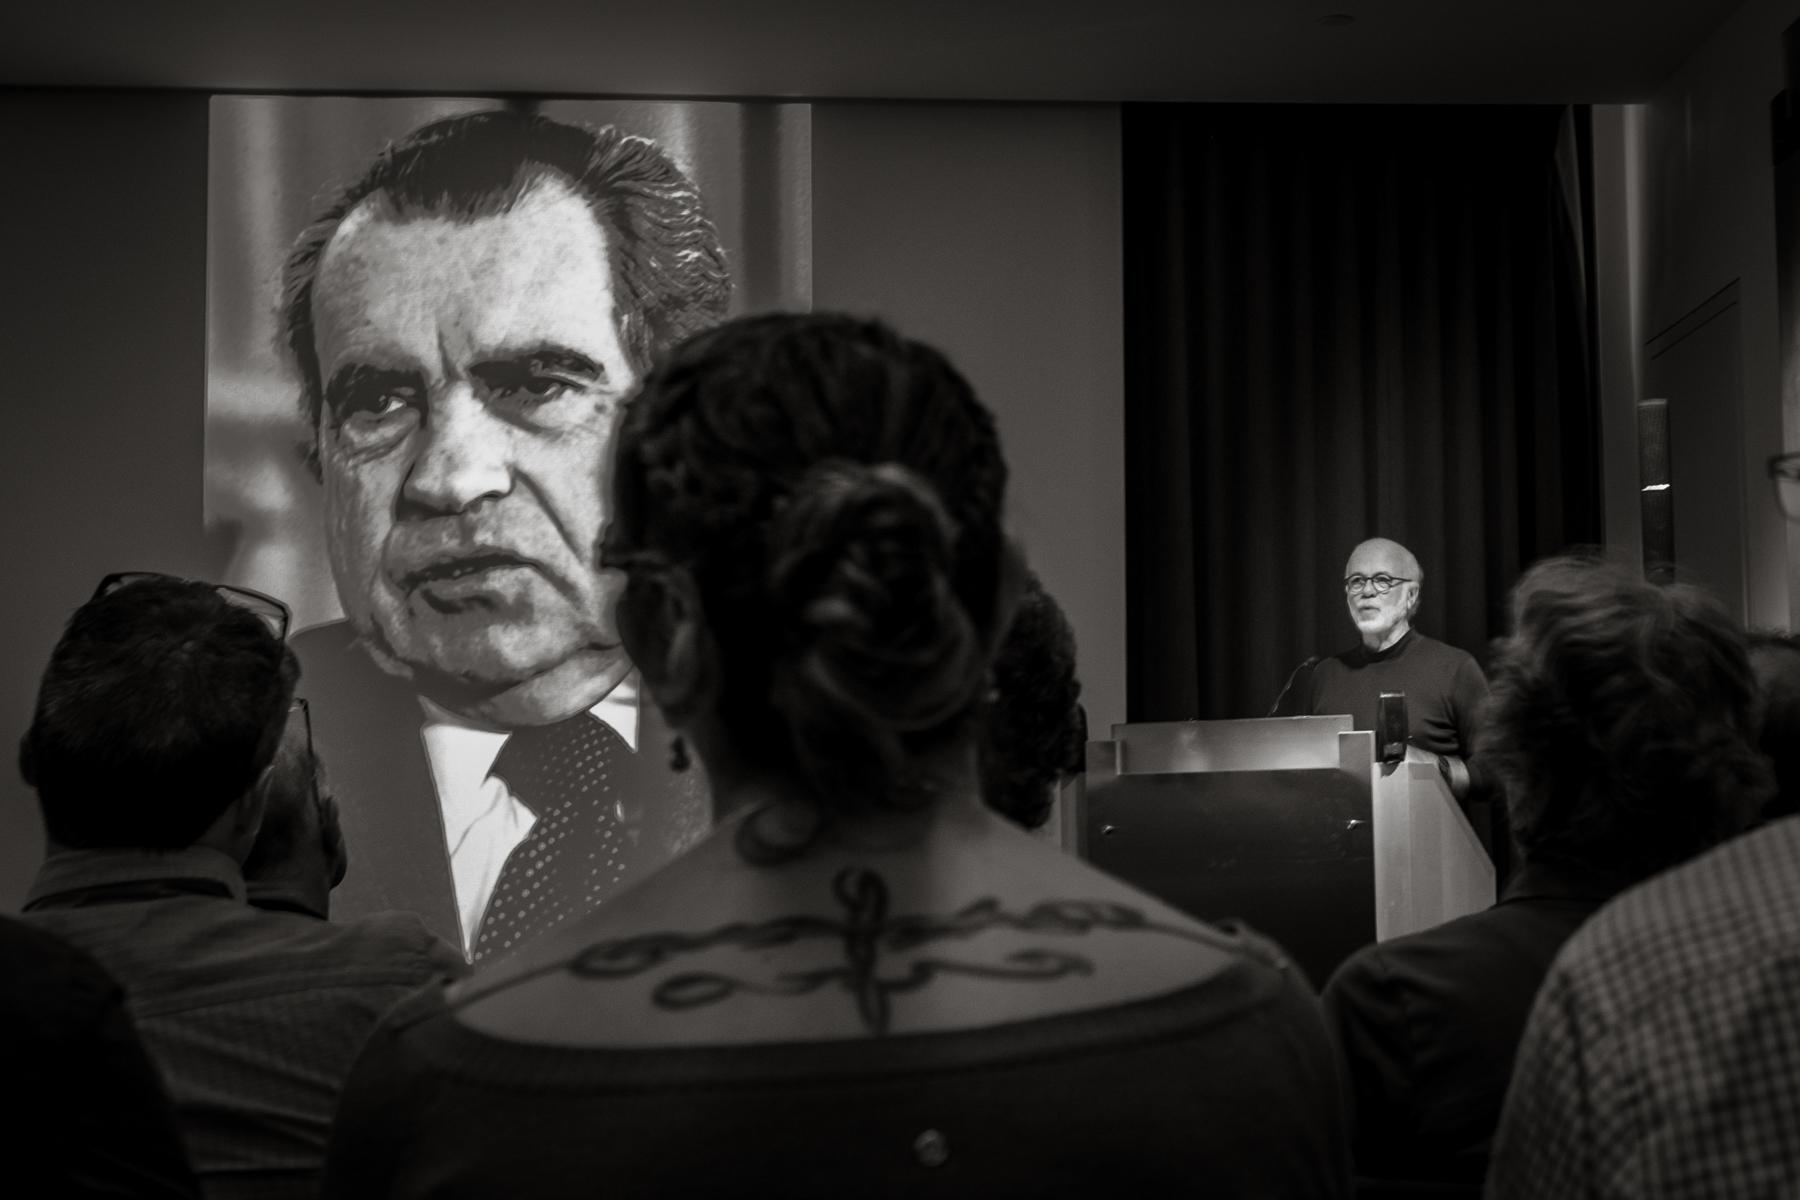 photojournalist David Hume Kennerly   Boston, 2016